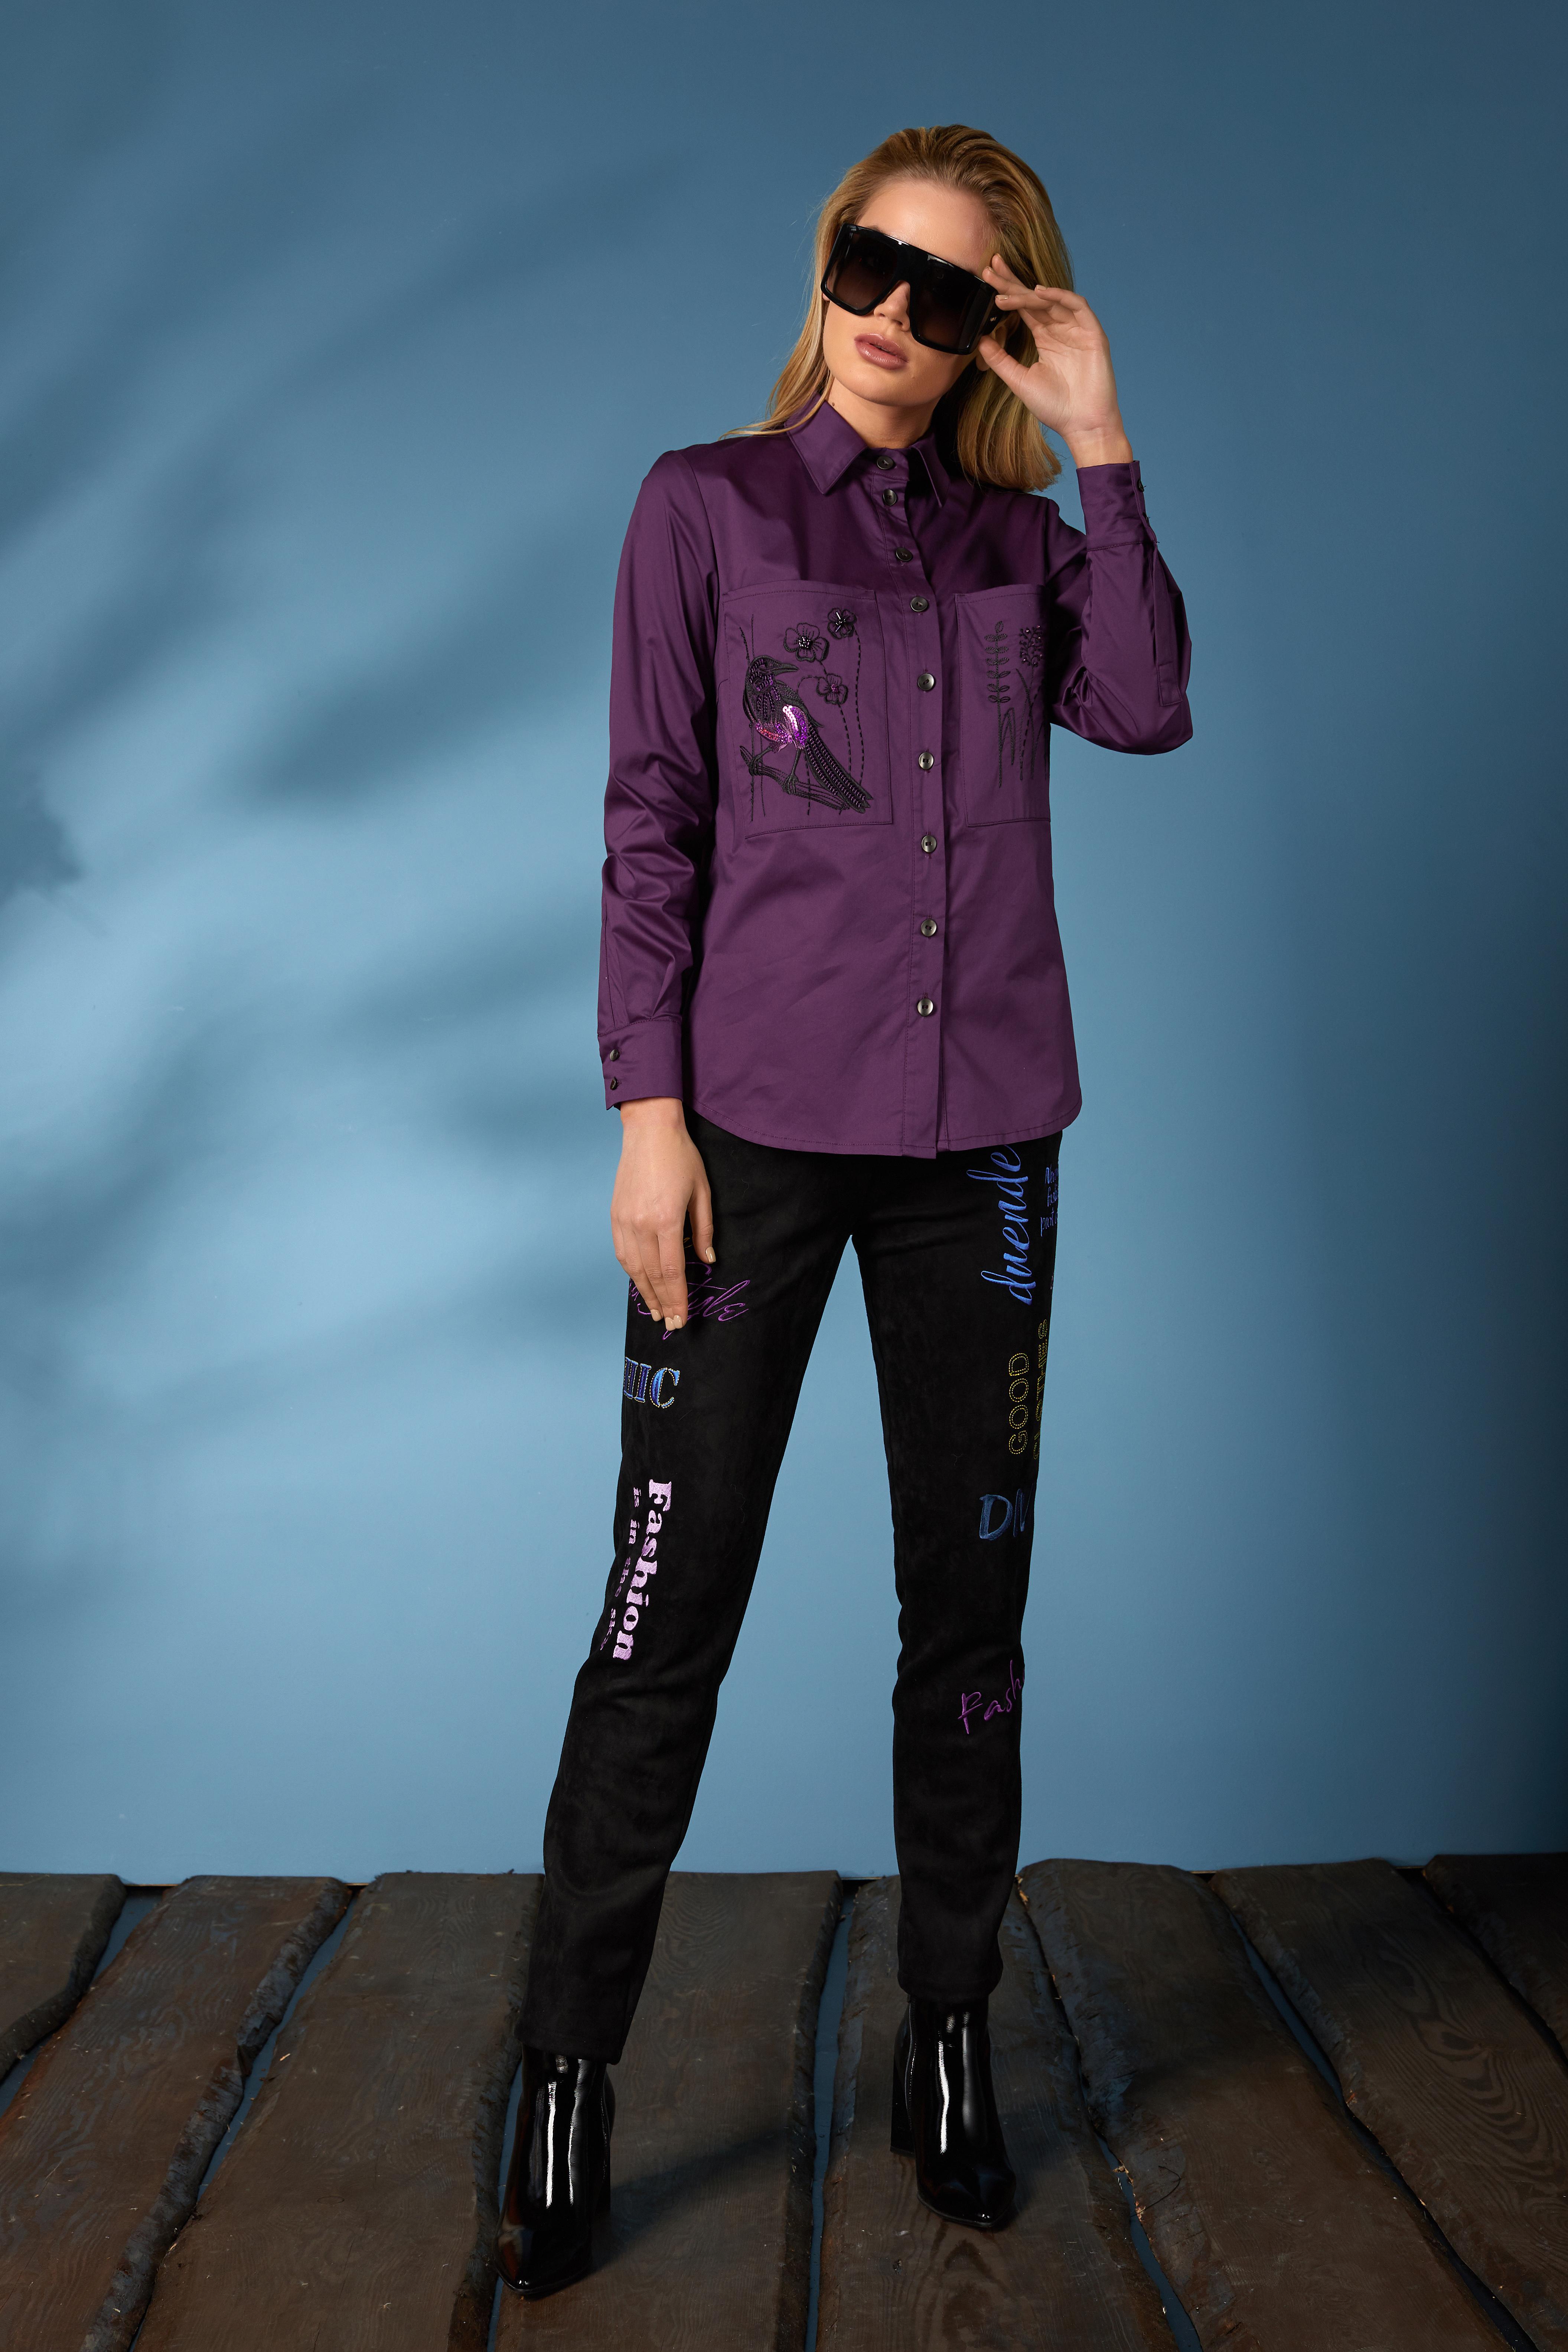 Рубашка 619-2, джинсы 631 (4)